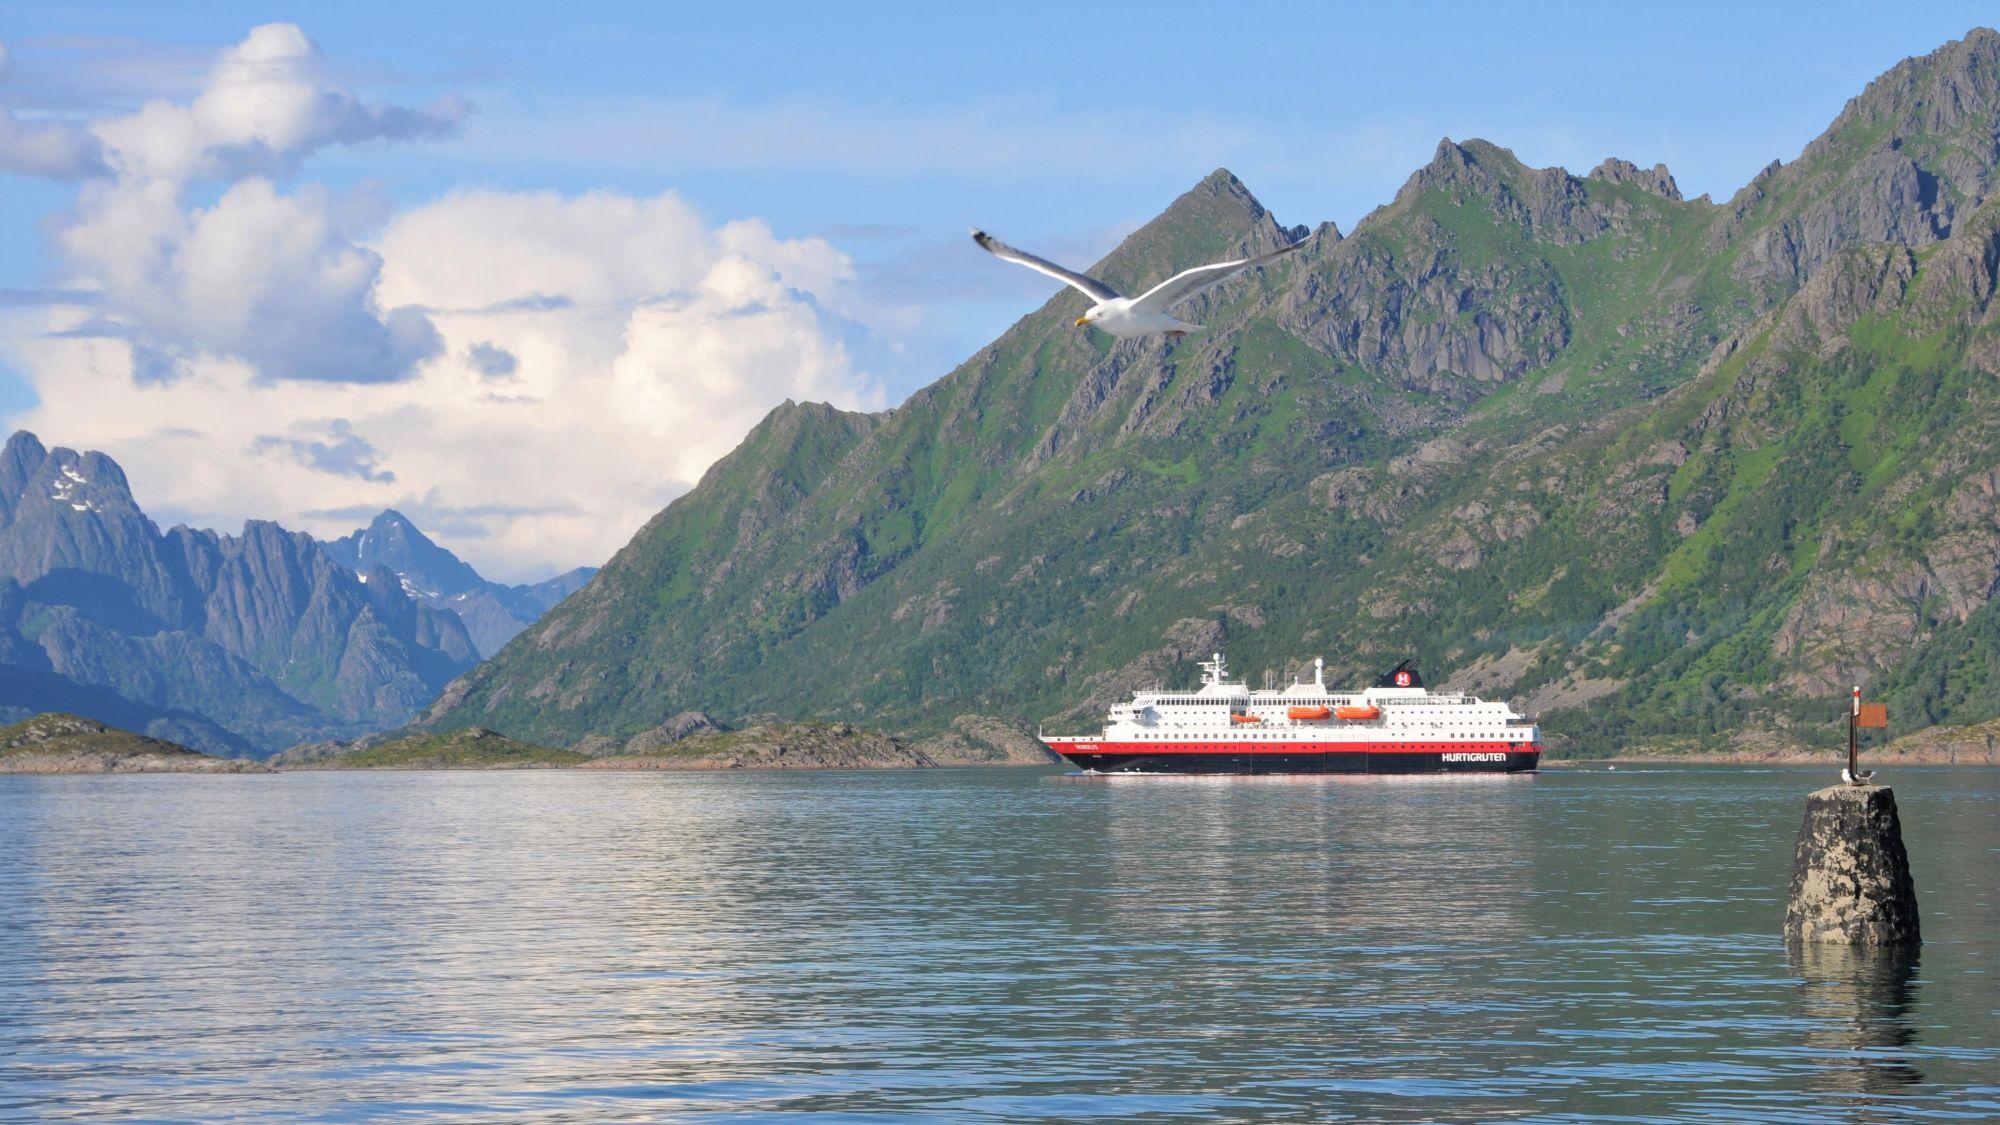 Hurtigrutenschiff vor den Lofoten